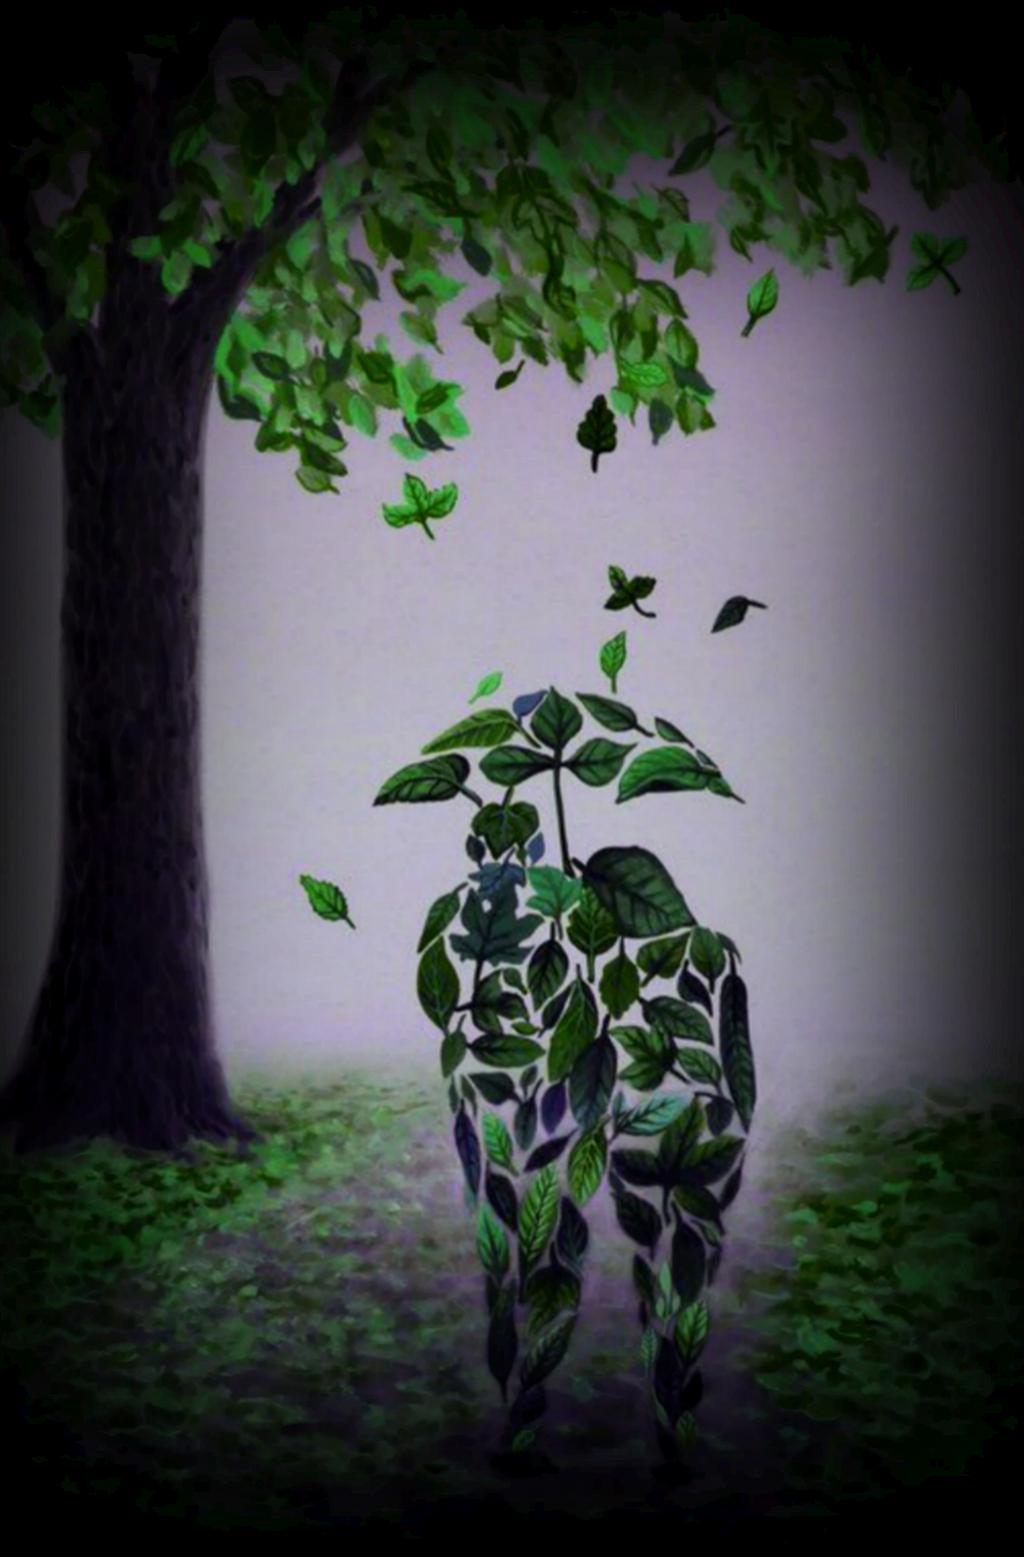 #ftestickers #couple #umbrella #leaves #doubleexposure